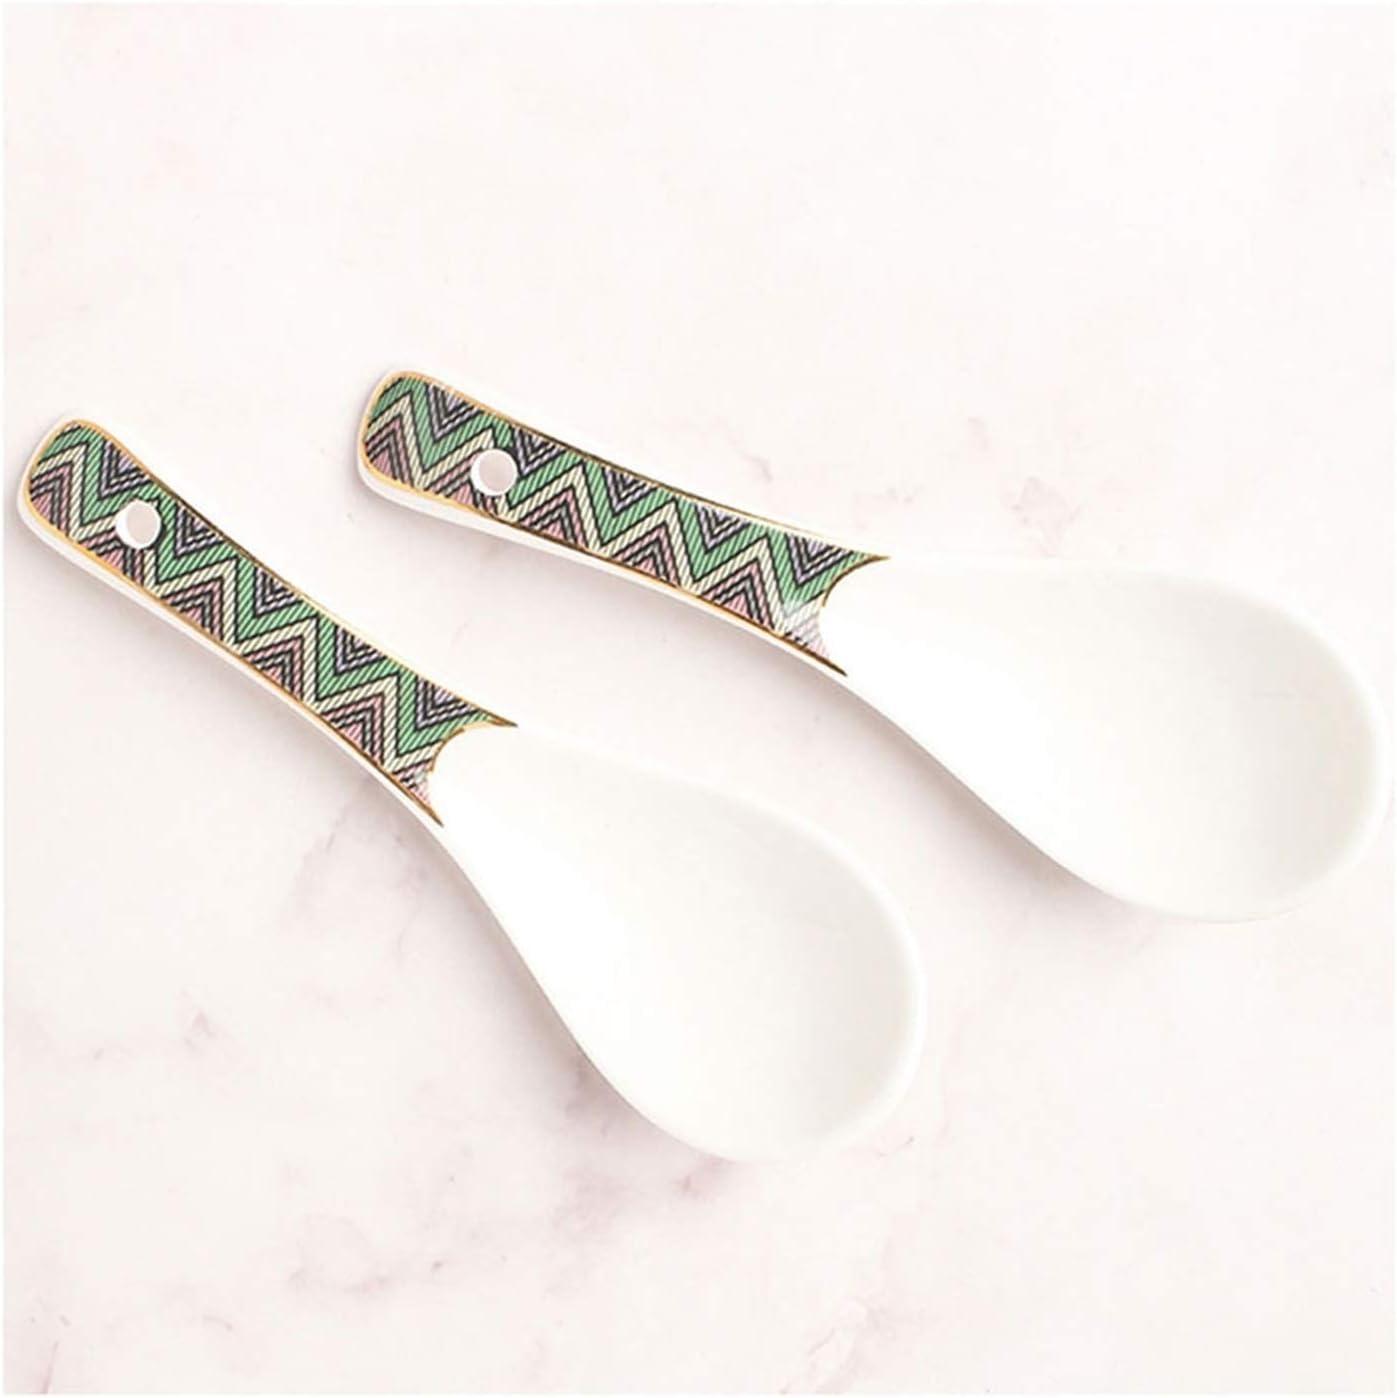 Kitchen Ladles Soup Sacramento Max 88% OFF Mall Ladle Spoons Spoon Ceramic Set Househol